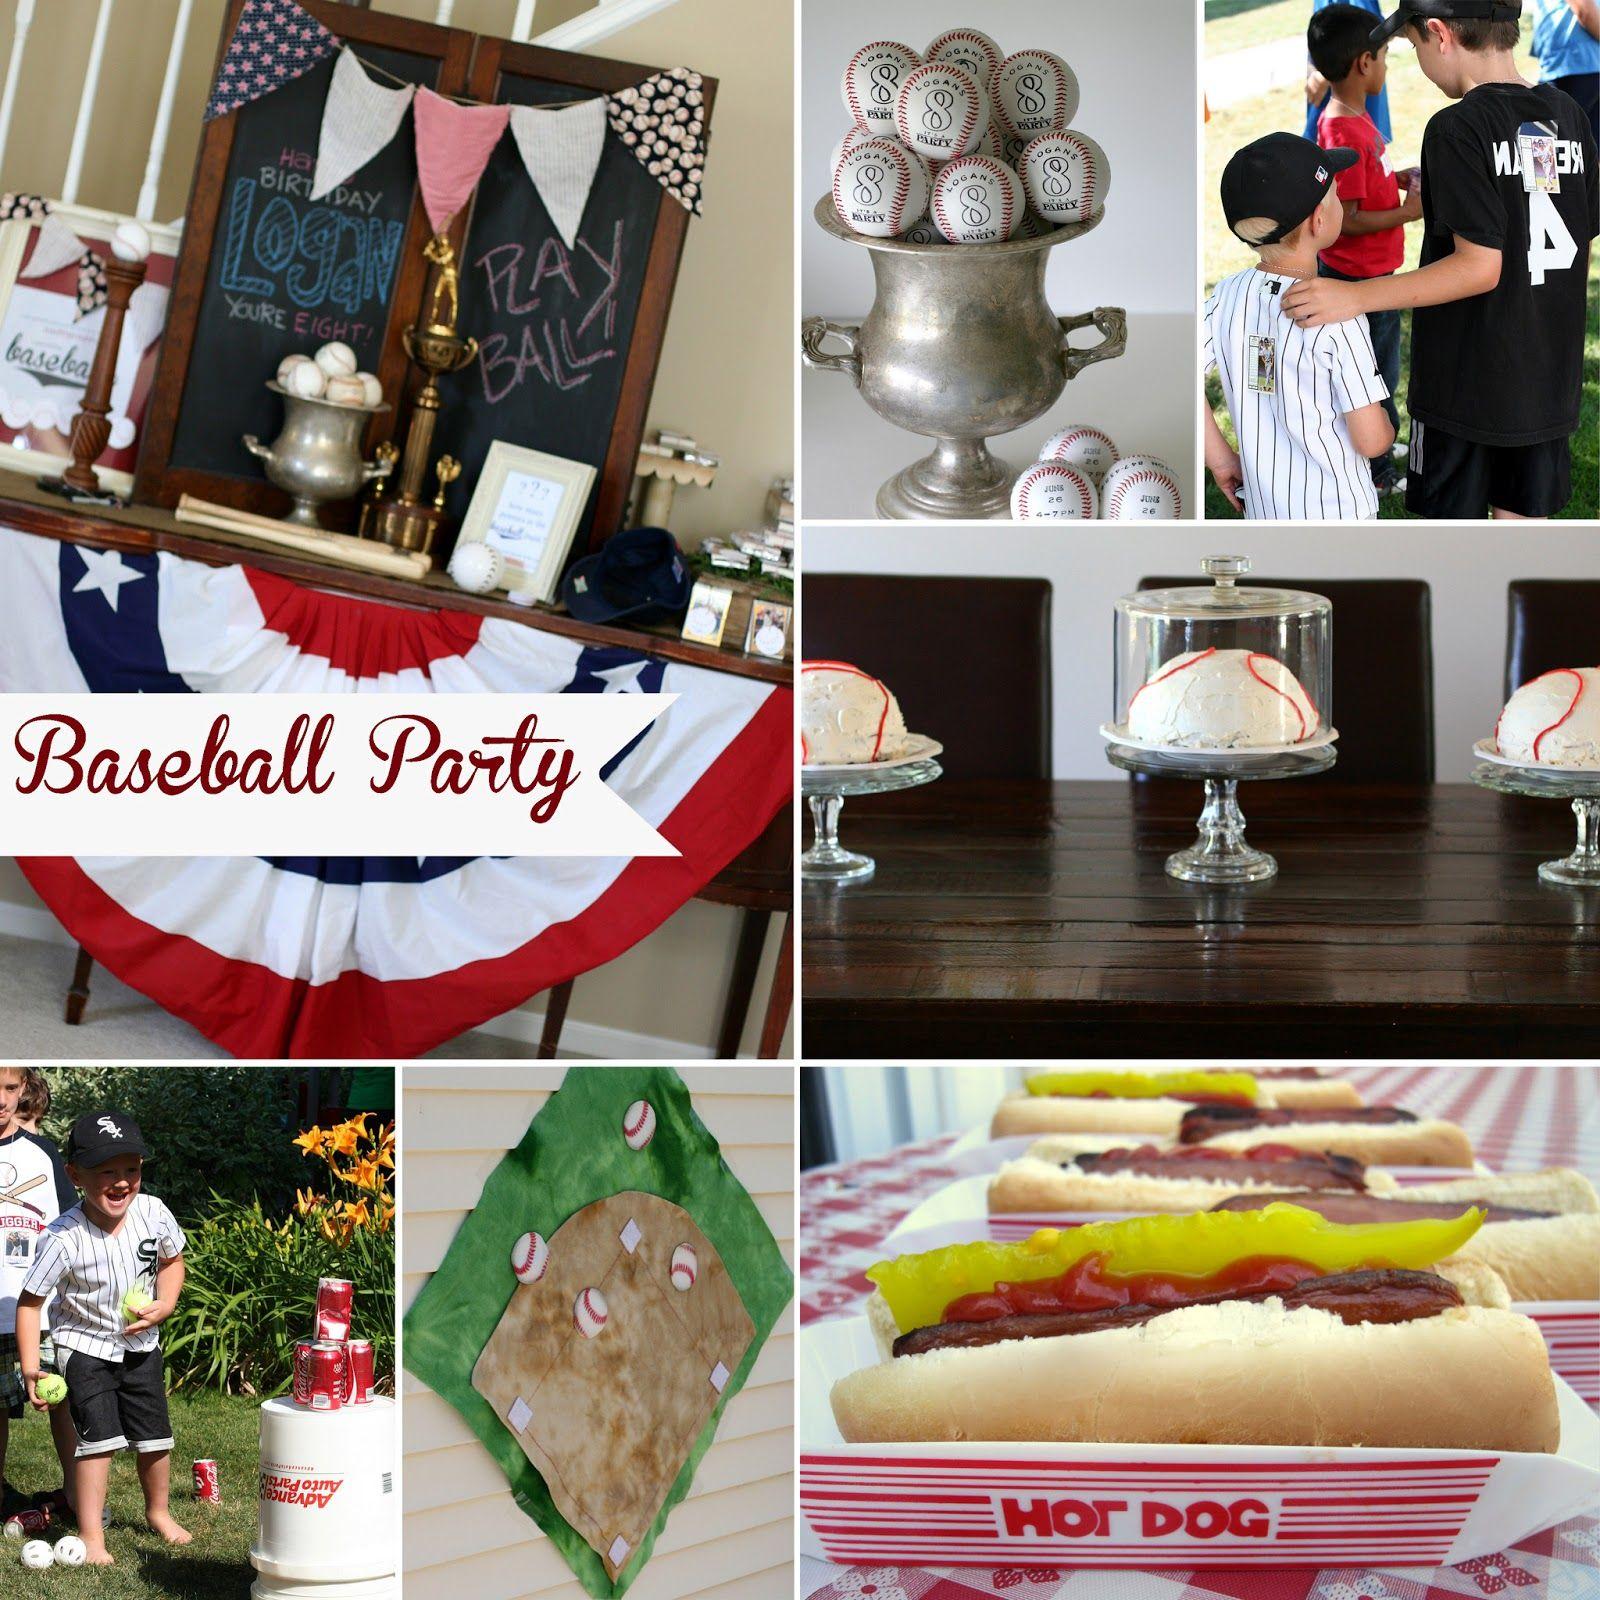 Baseball Party Ideas, Invitations, Decorations, Activities